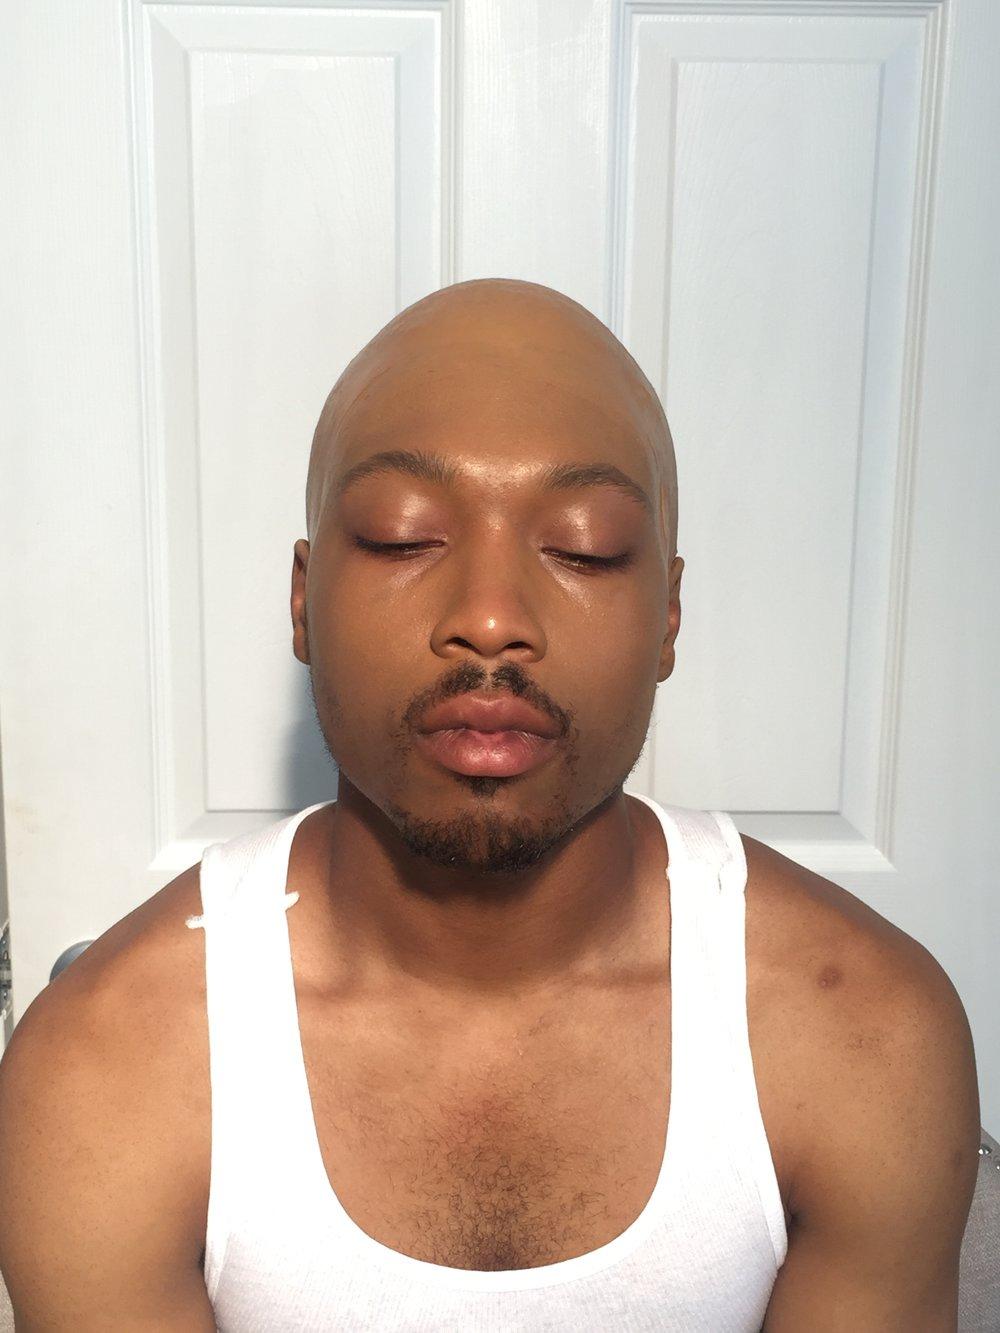 After Bald Cap